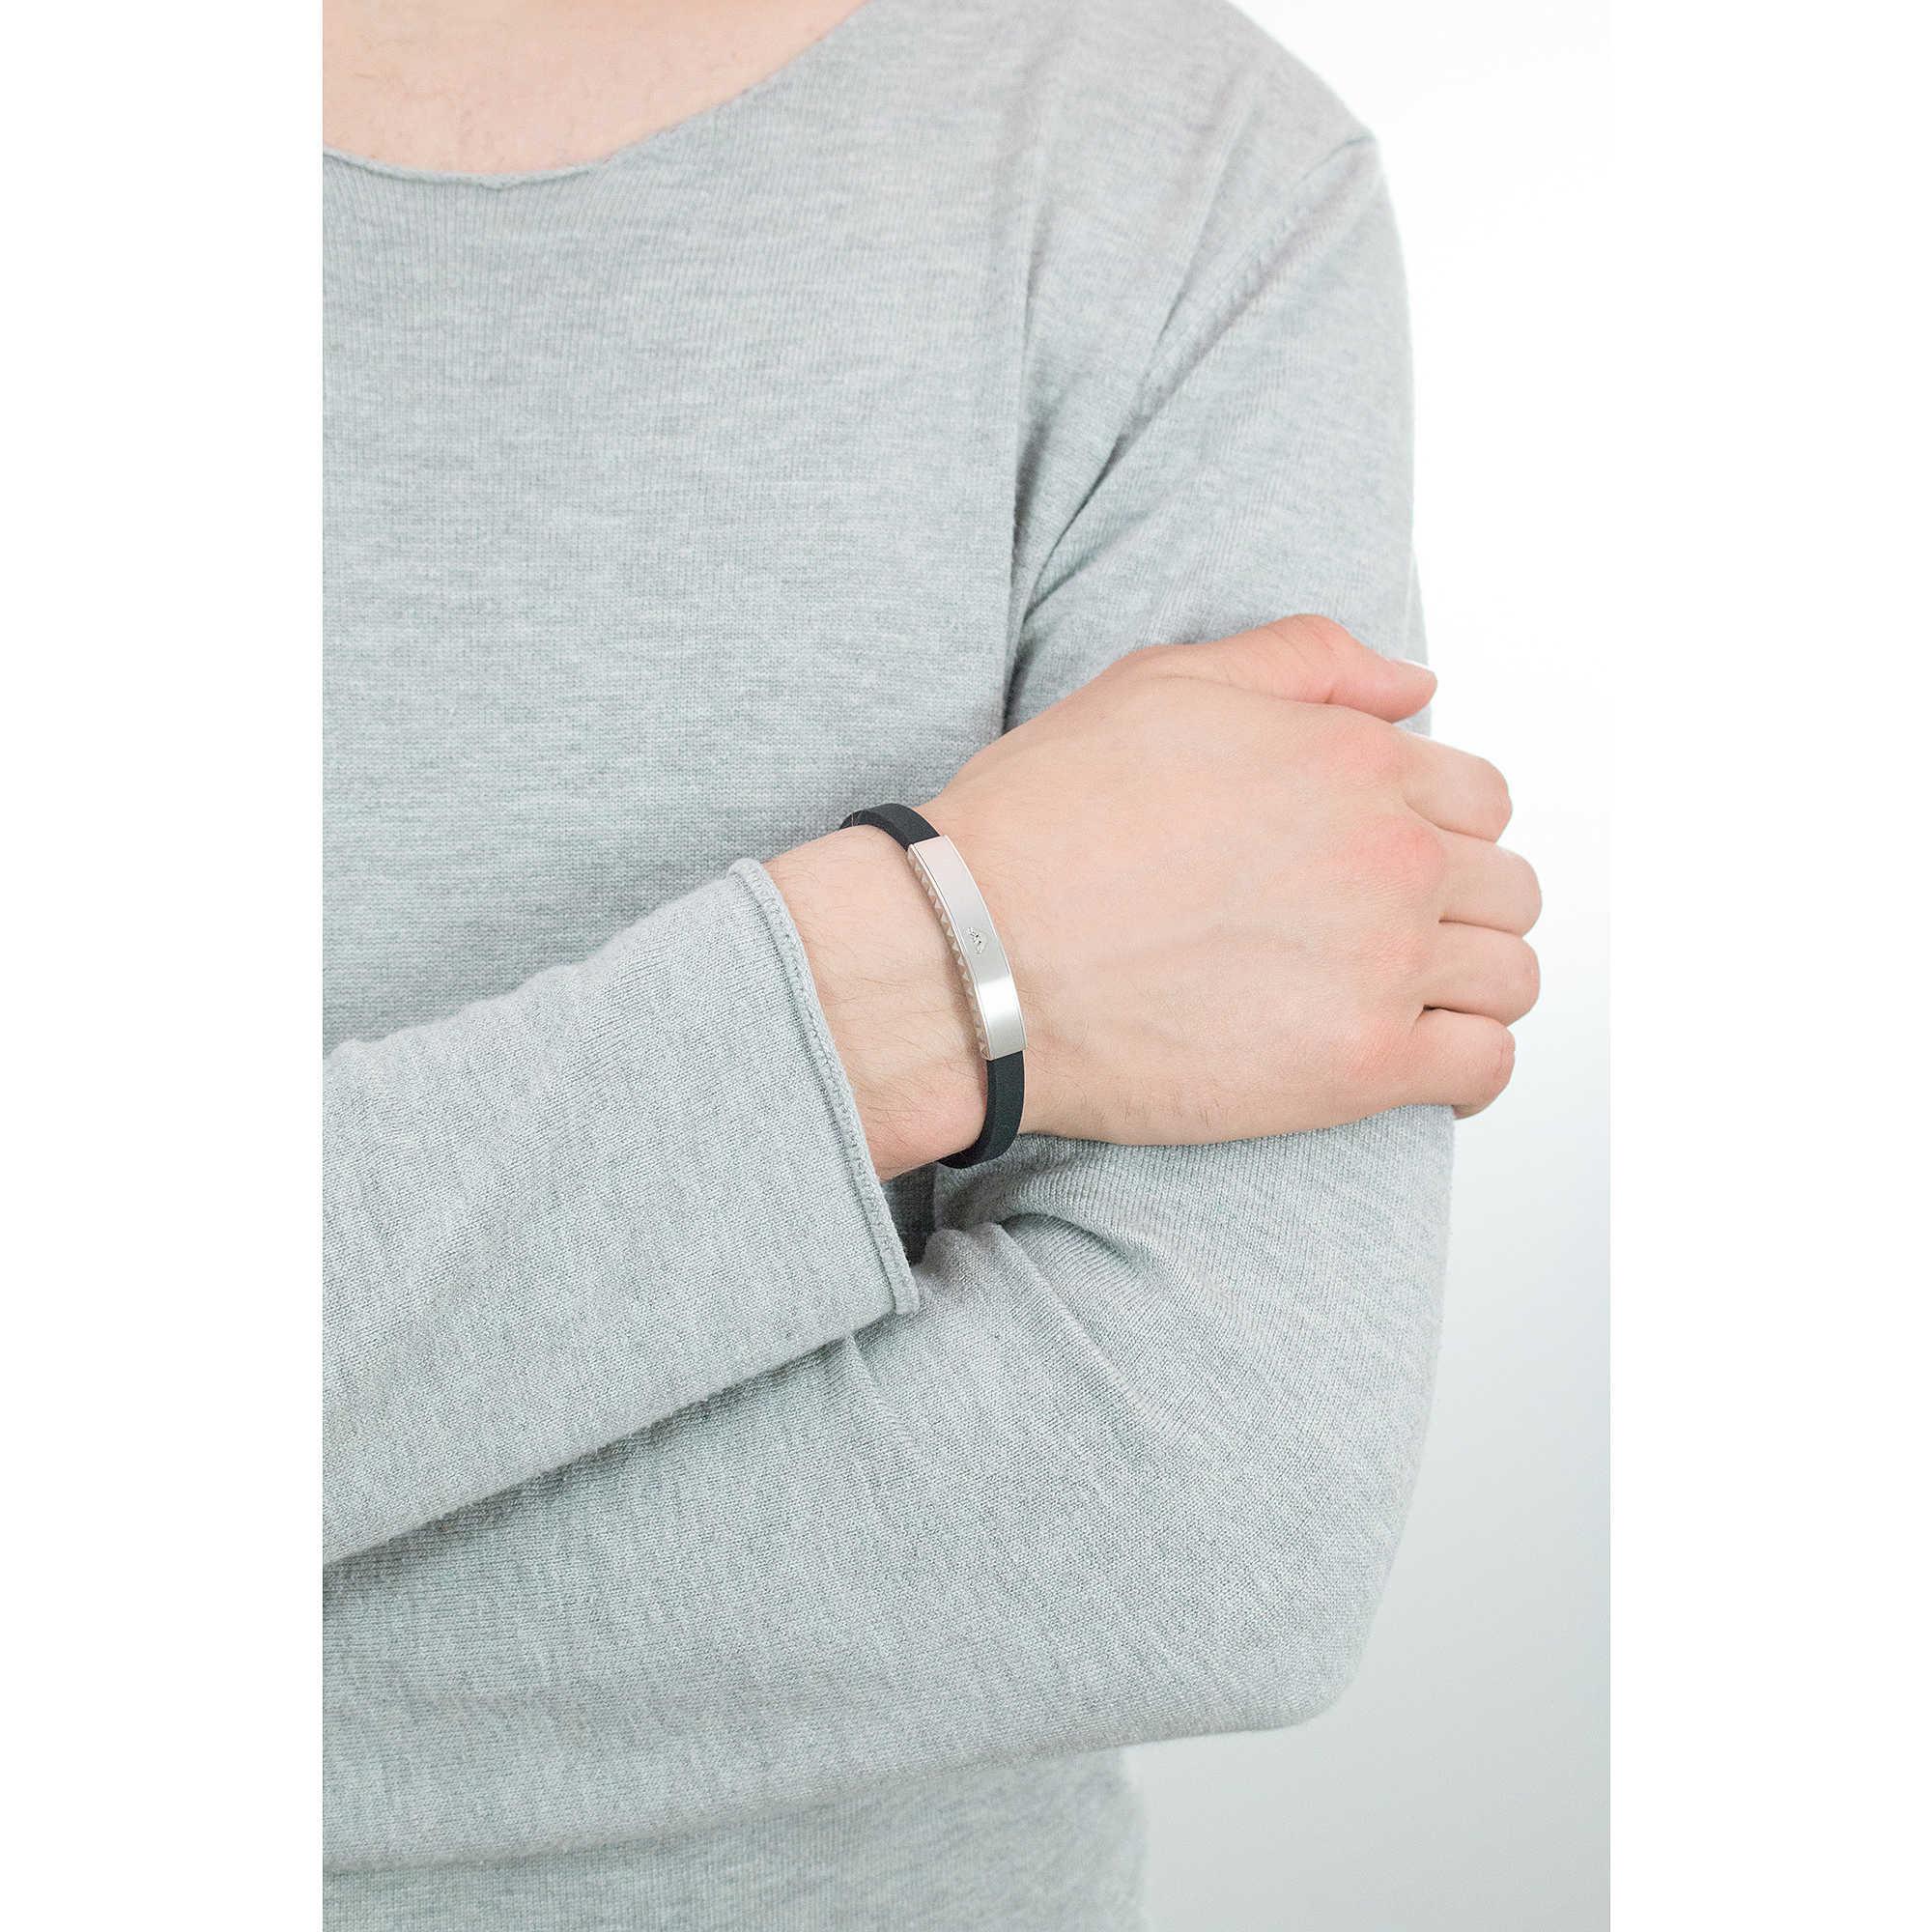 bracelet man jewellery Emporio Armani EGS1882040. zoom. Emporio Armani  bracelets man EGS1882040 photo wearing. zoom 6a0e3e8e176